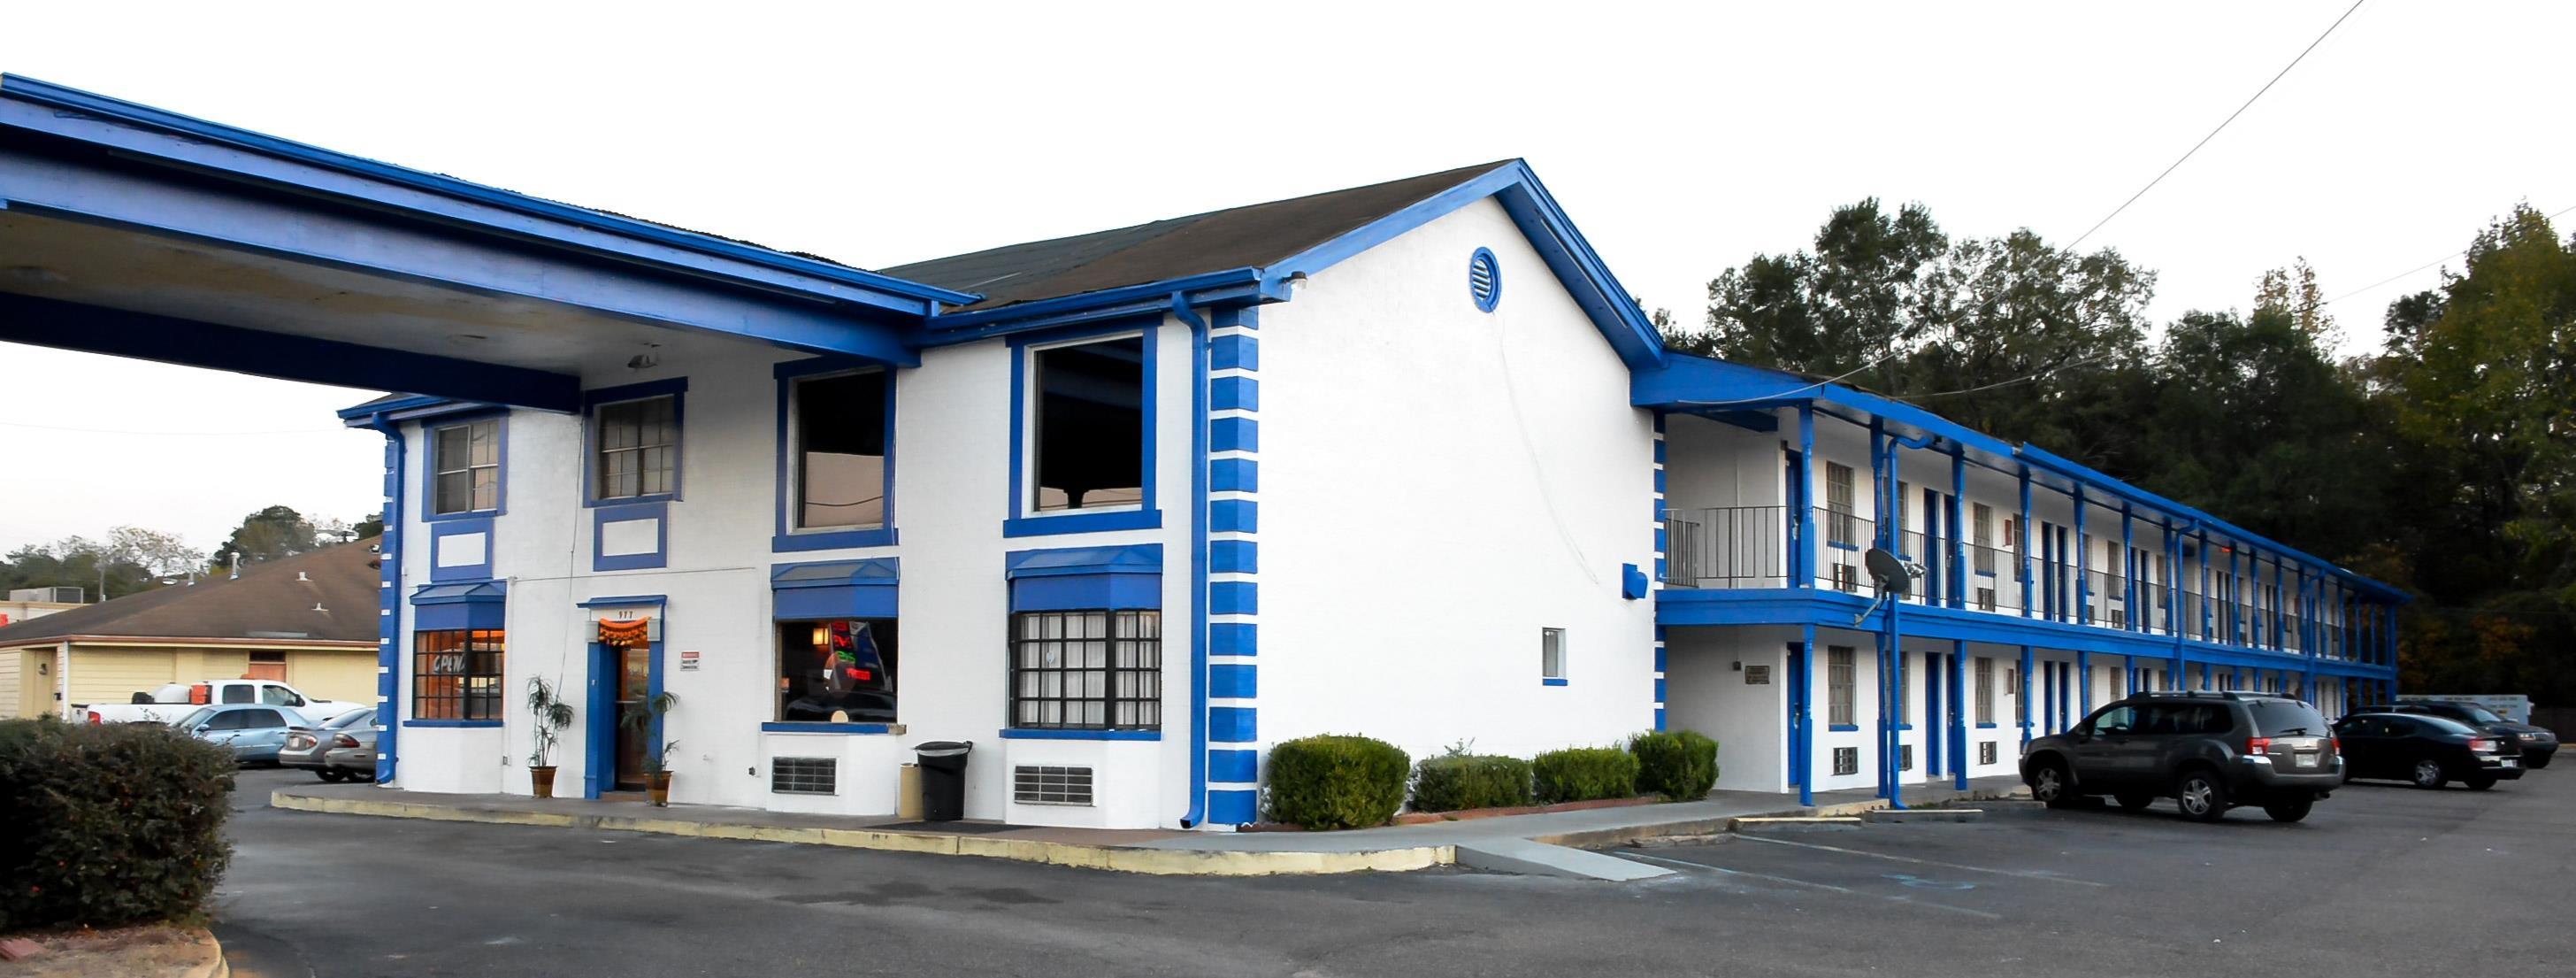 America U0026 39 S Best Inn - Montgomery South In Montgomery  Al 36105